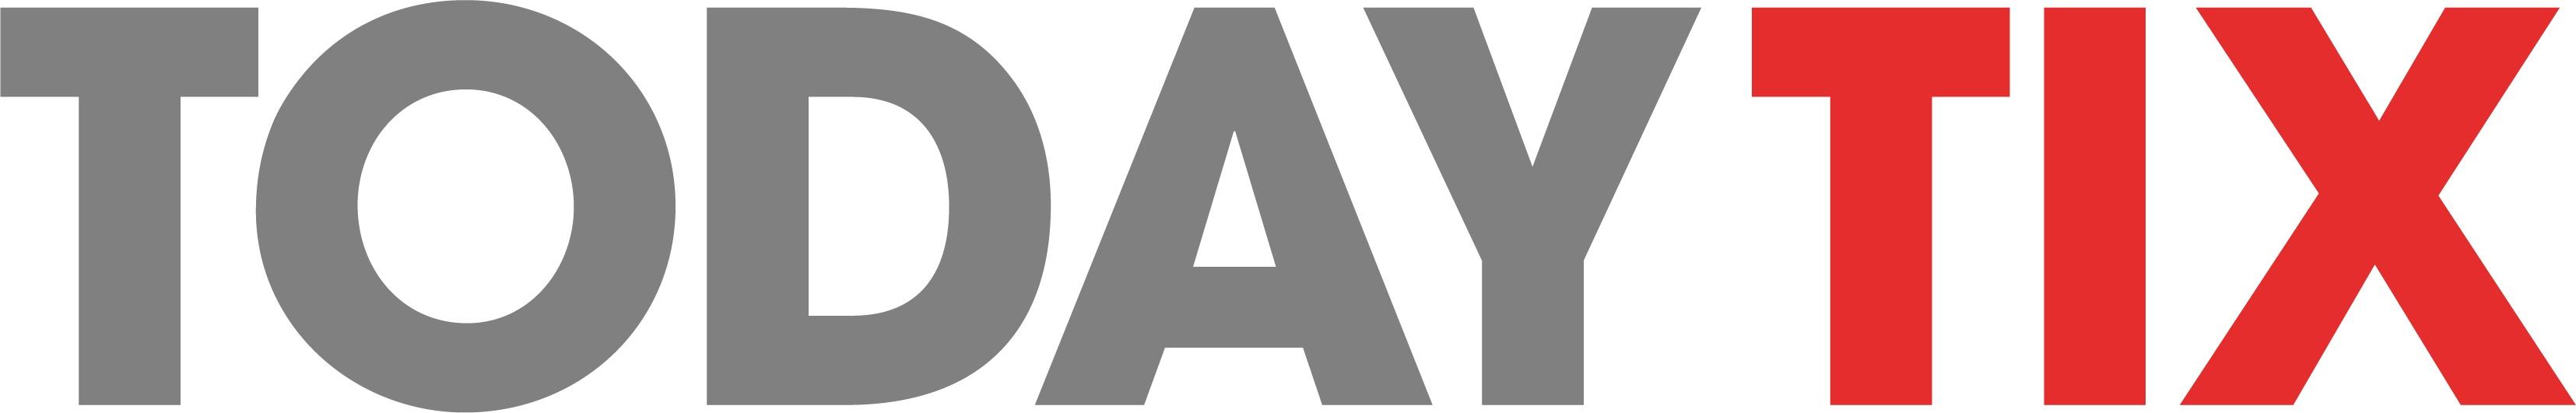 TodayTix_Logo_RGB_GrayRed.jpg